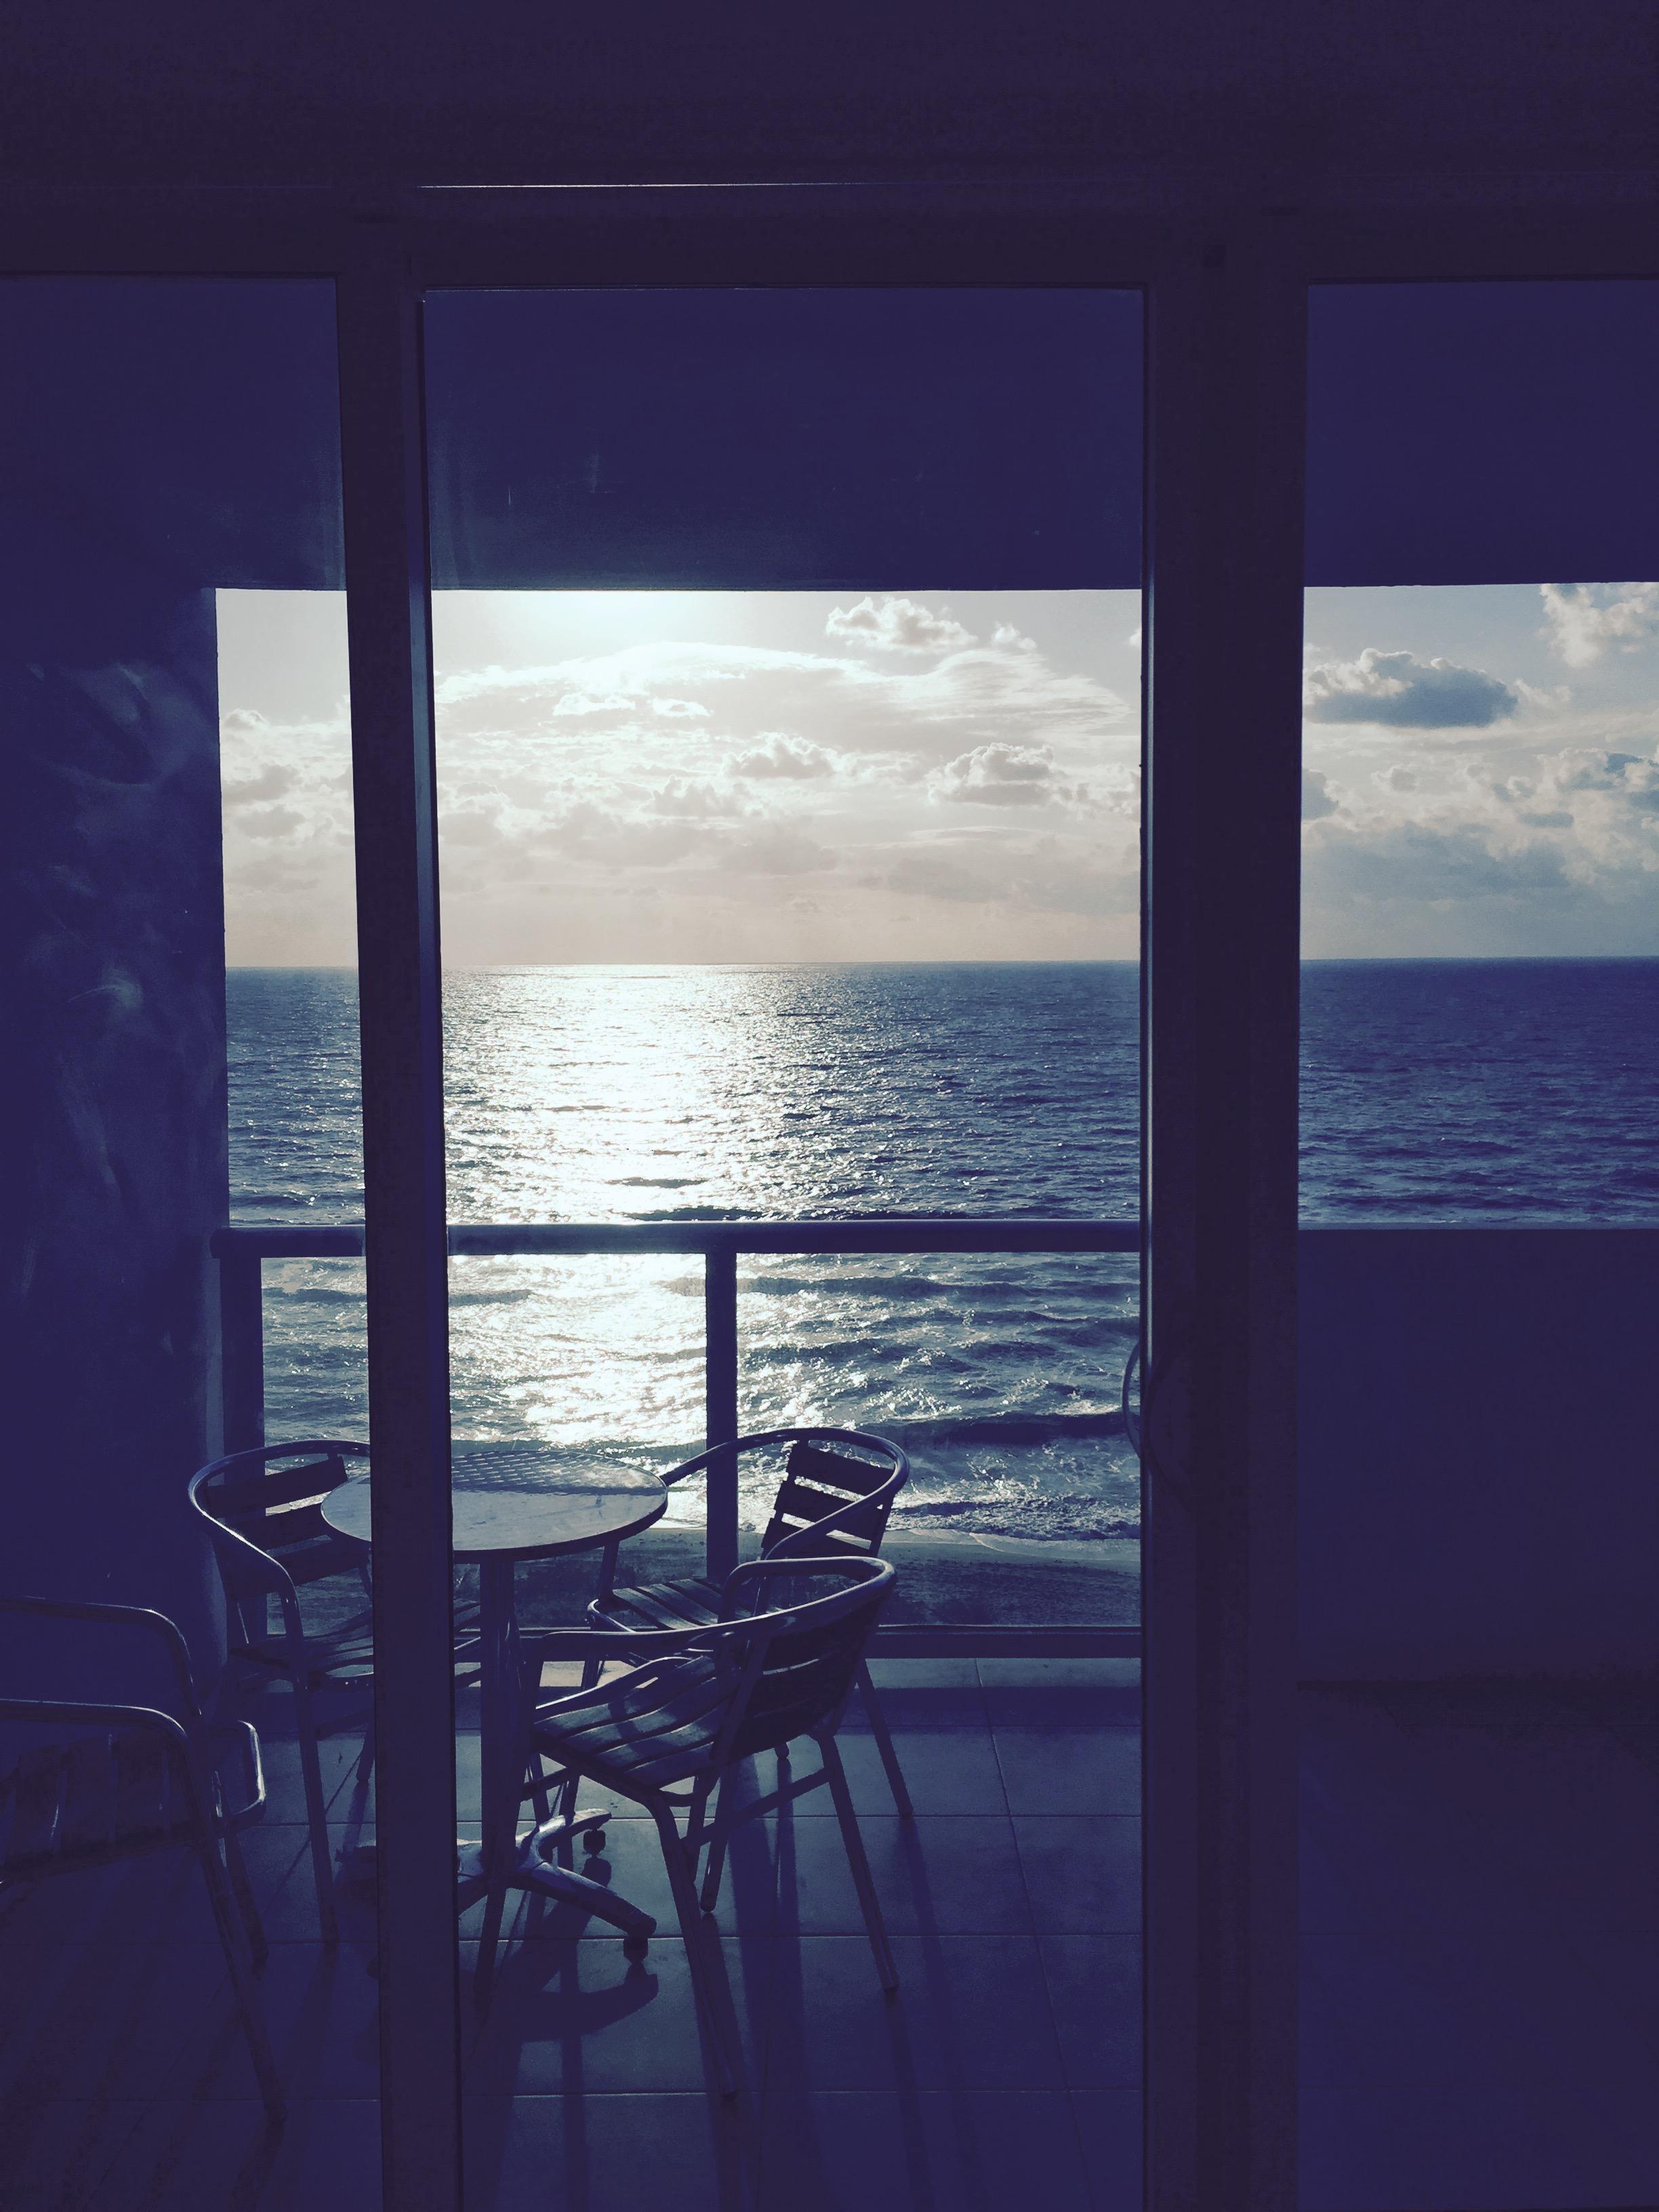 8th floor balcony with ocean/beach view